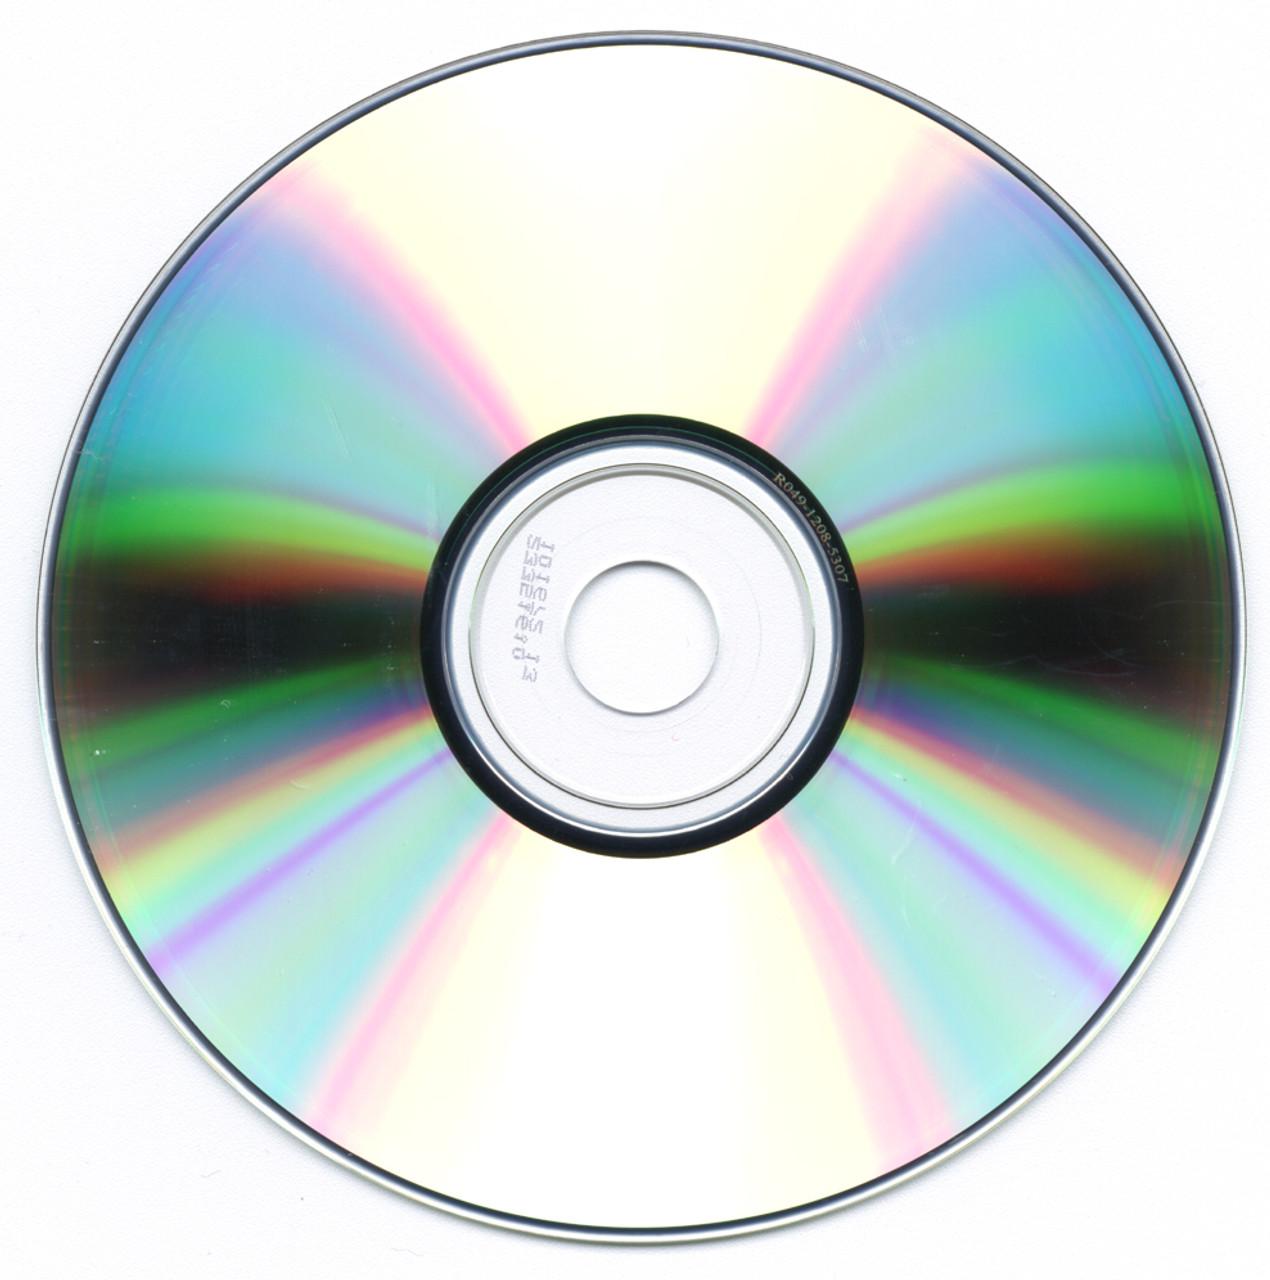 TorRey LSQ-40L Scale Software - Windows XP, Vista & 7